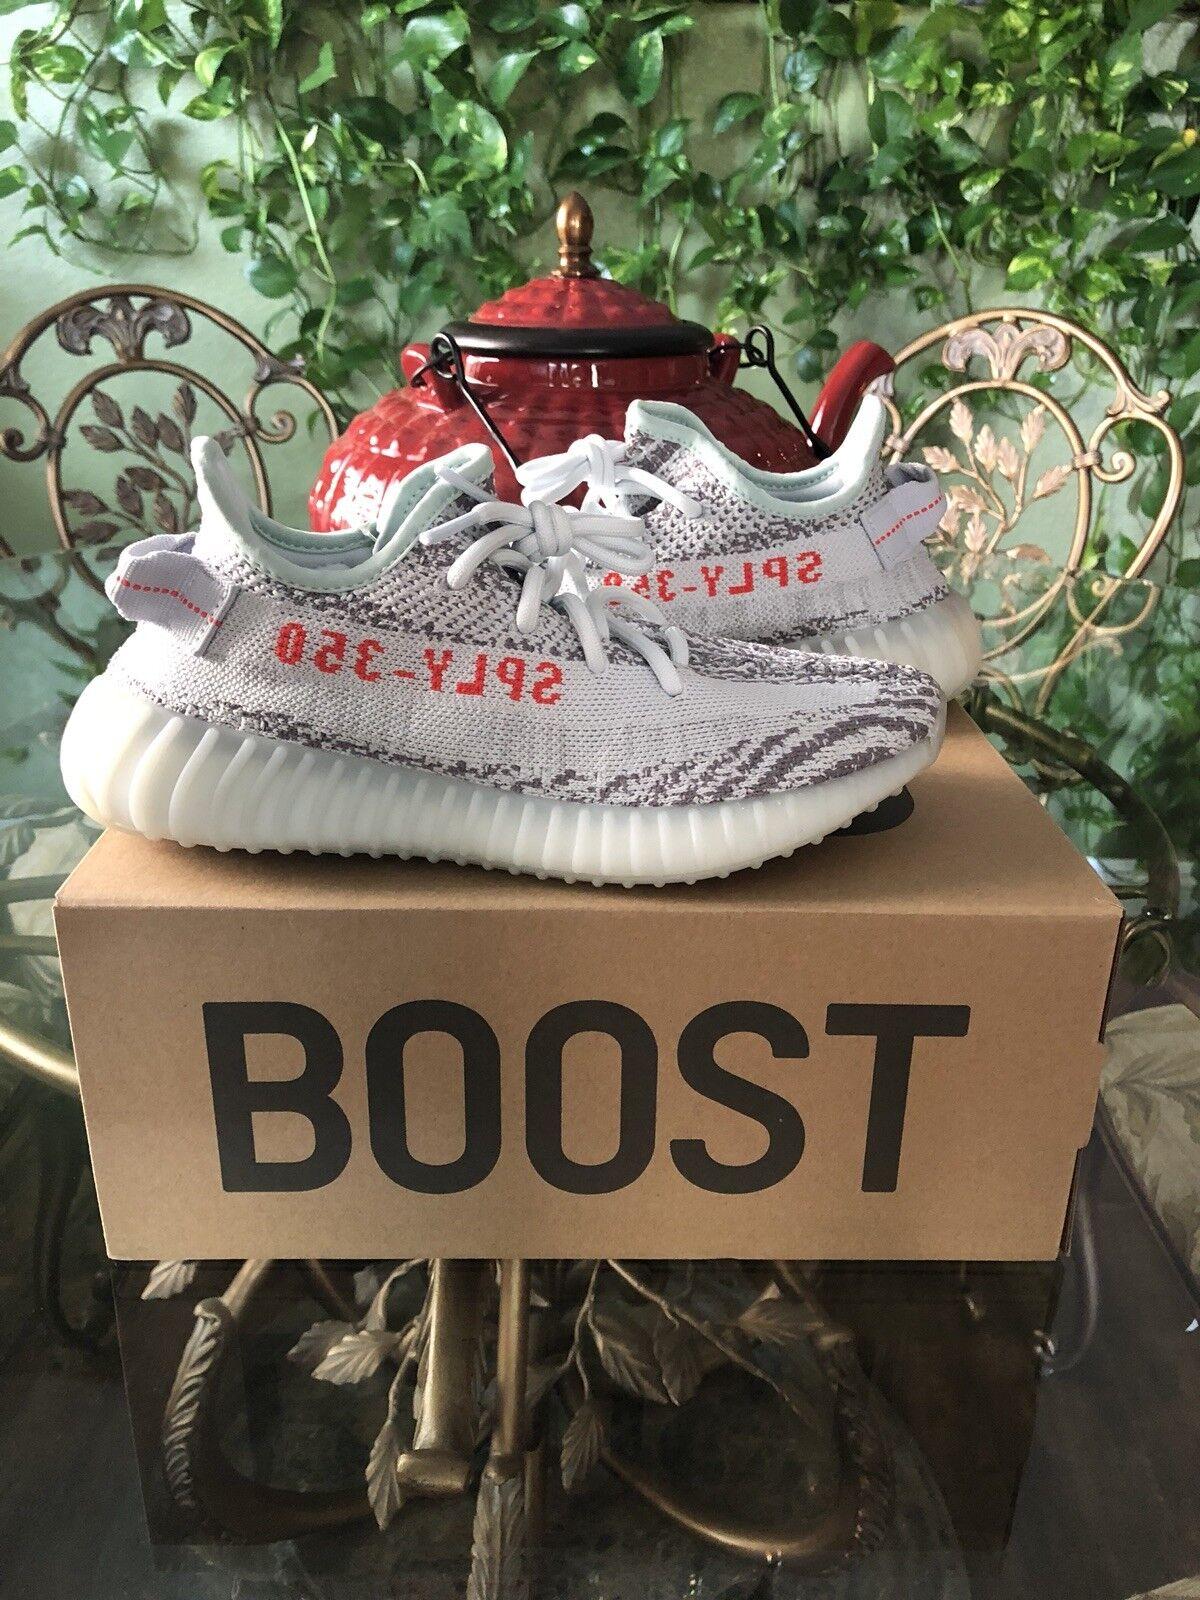 100% Authentic Adidas Yeezy Boost 350 V2 bluee Tint Kanye